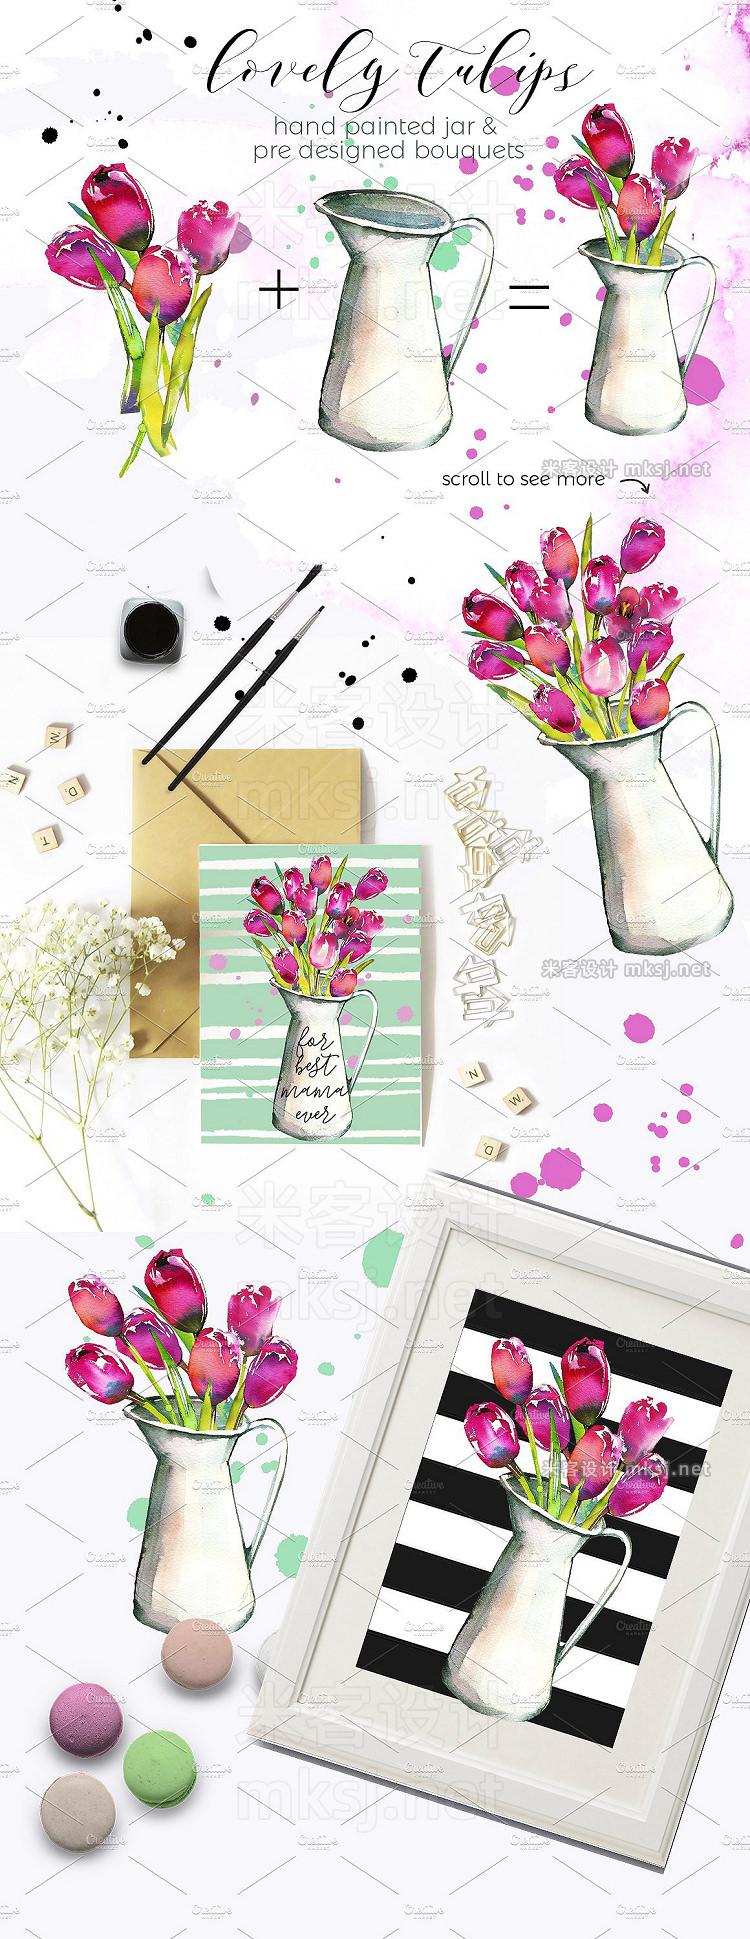 png素材 Spring Foliage Watercolor Bundle